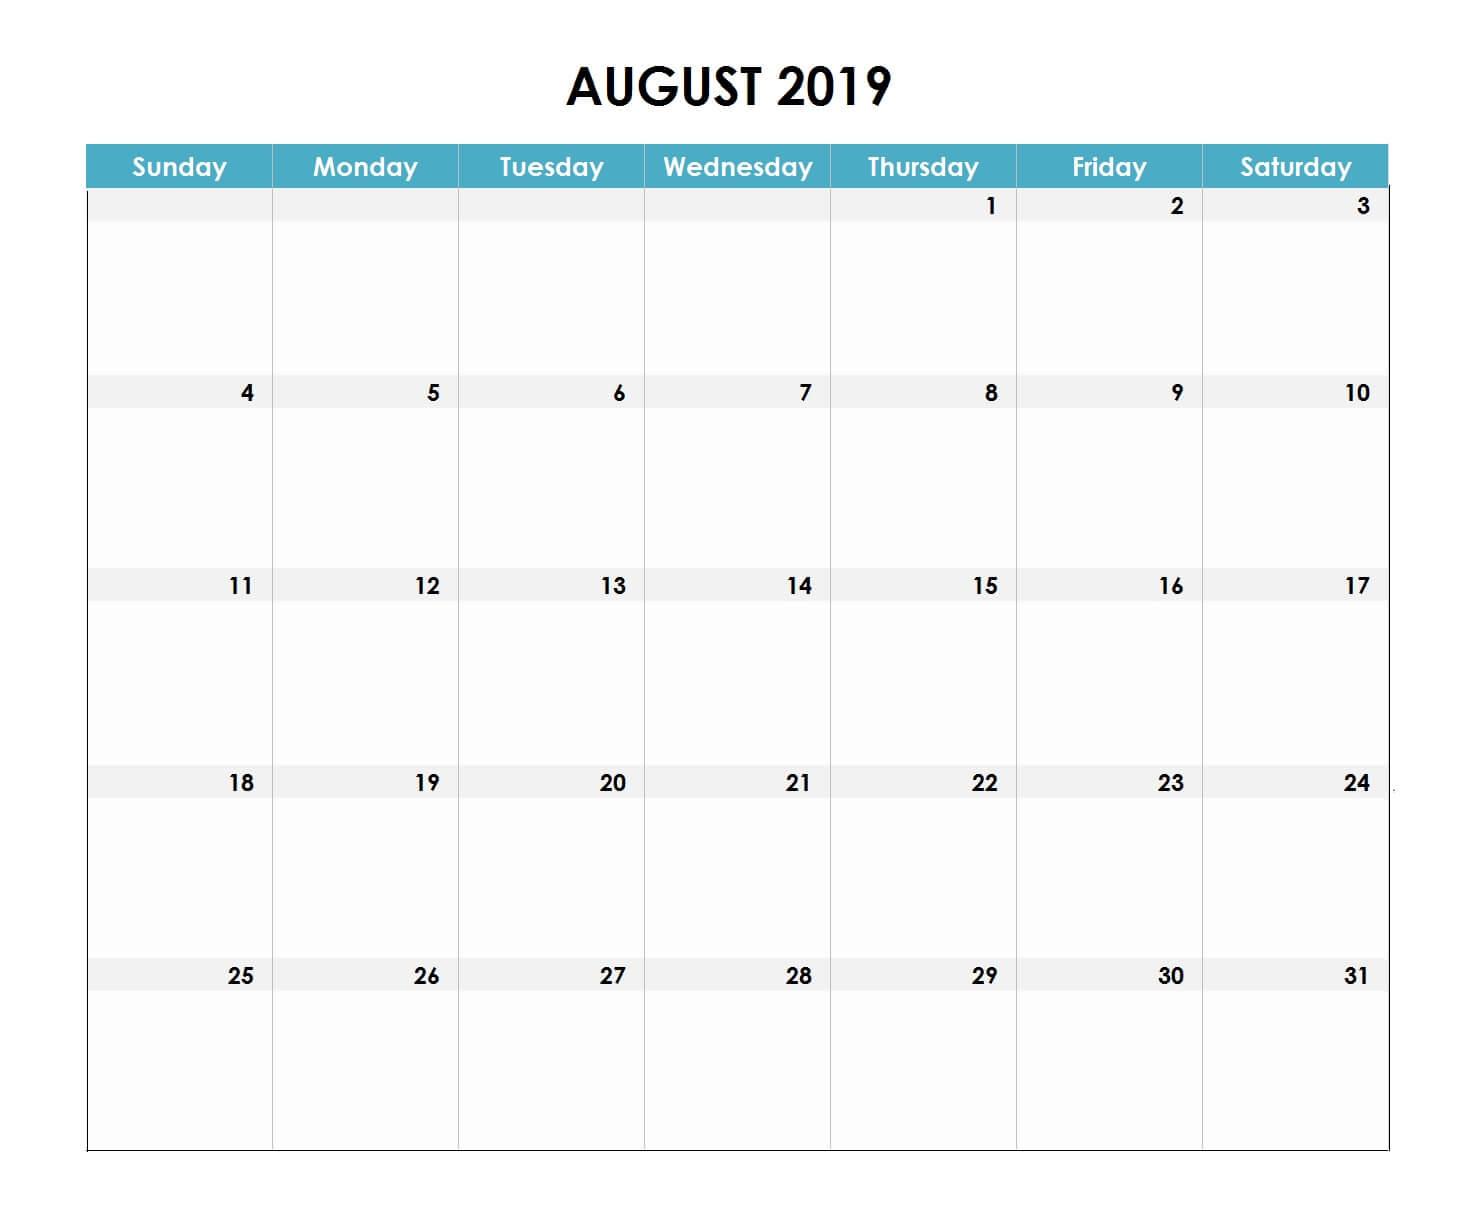 August 2019 Excel Calendar